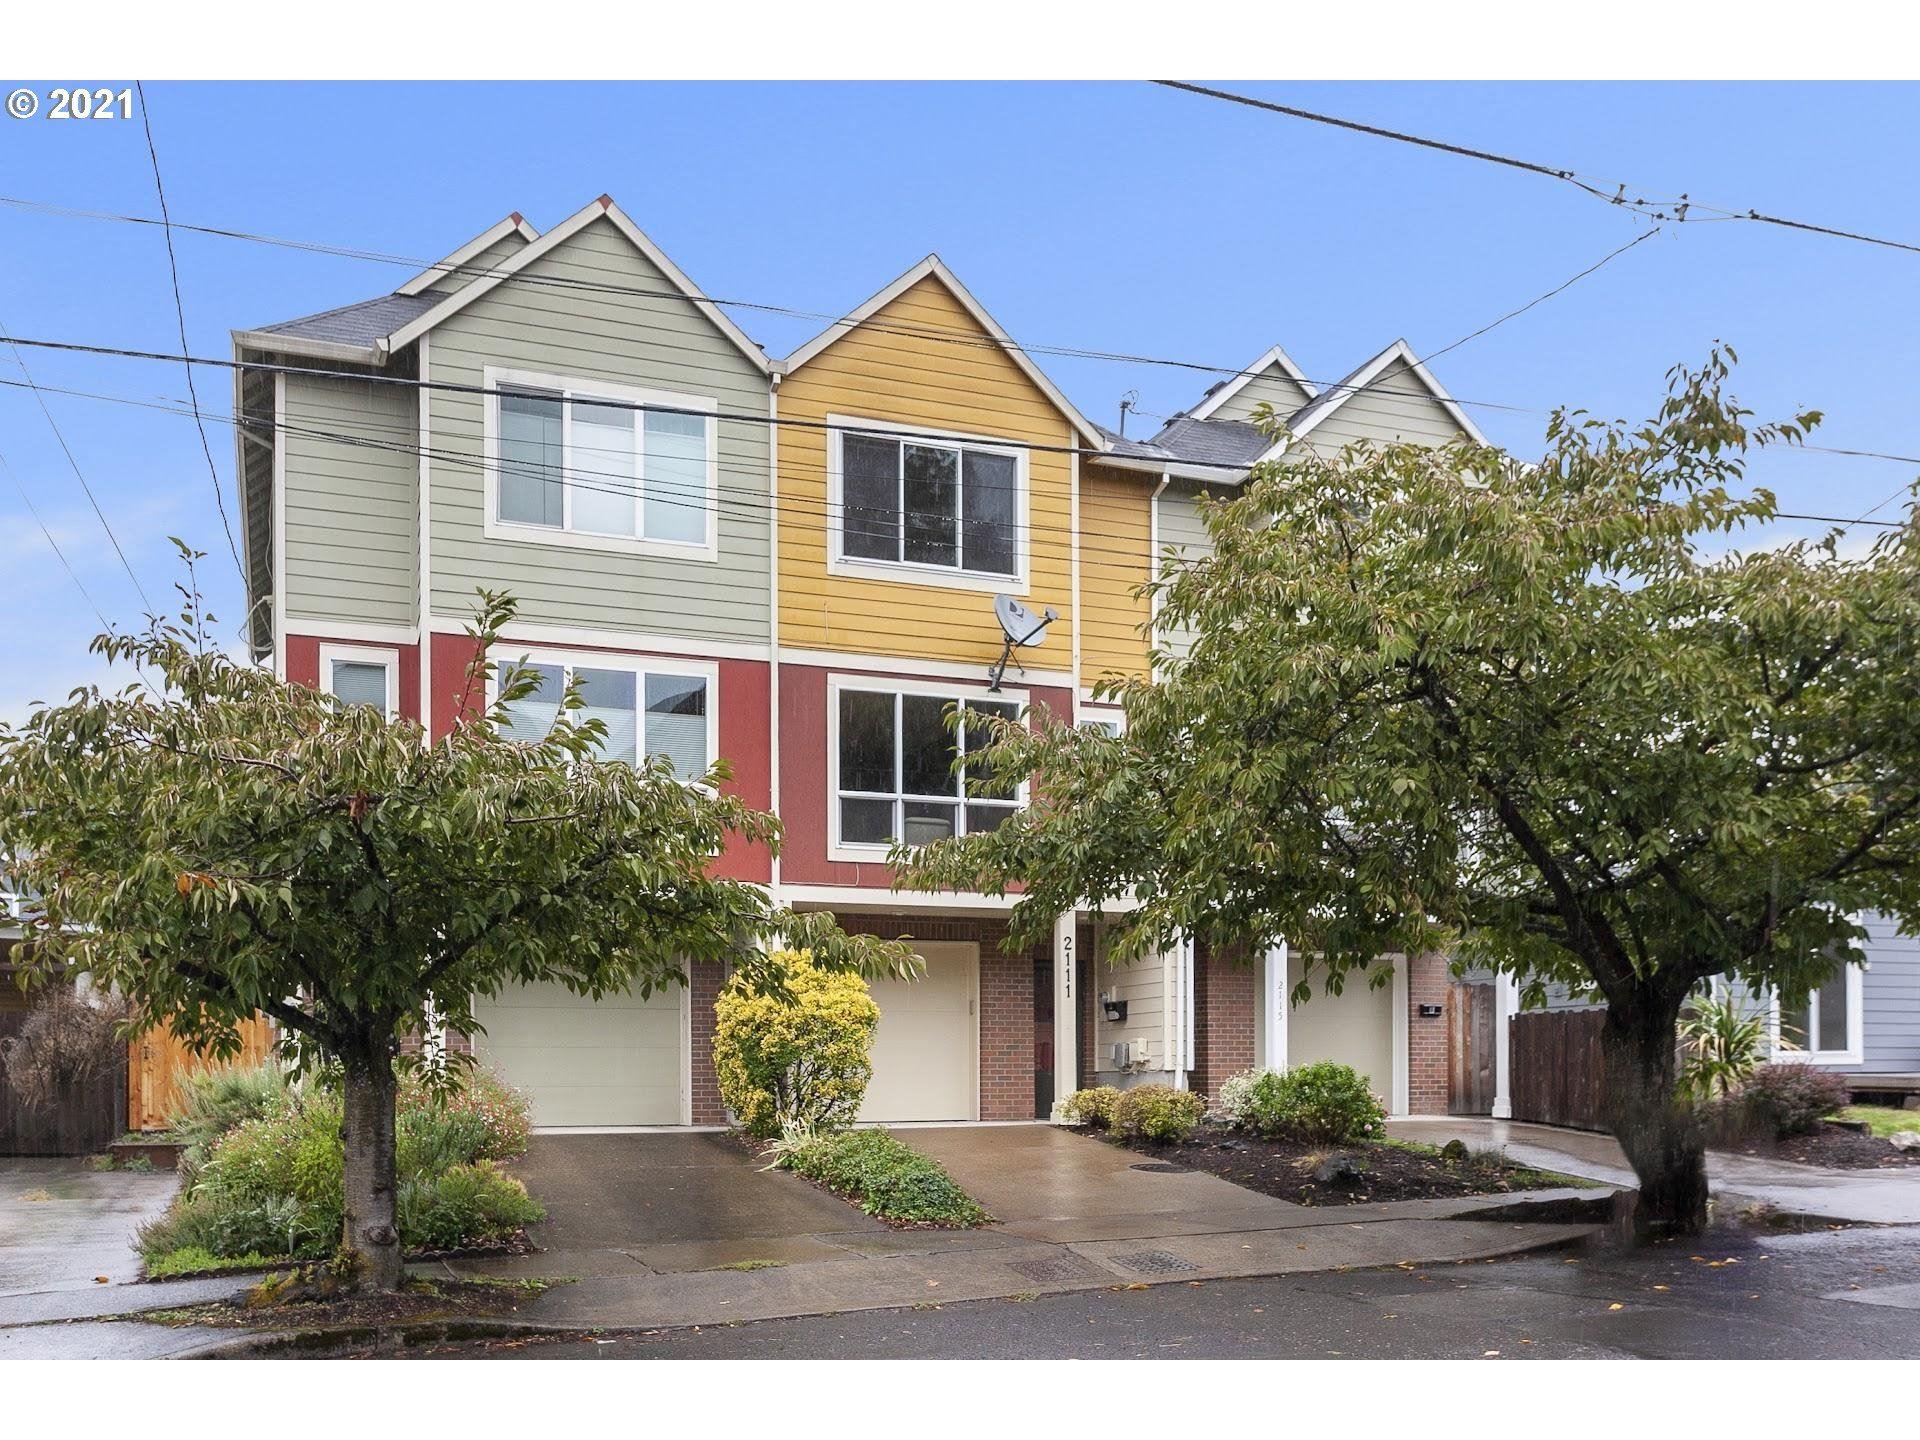 2111 SE TENINO ST, Portland, OR 97202 - MLS#: 21555031